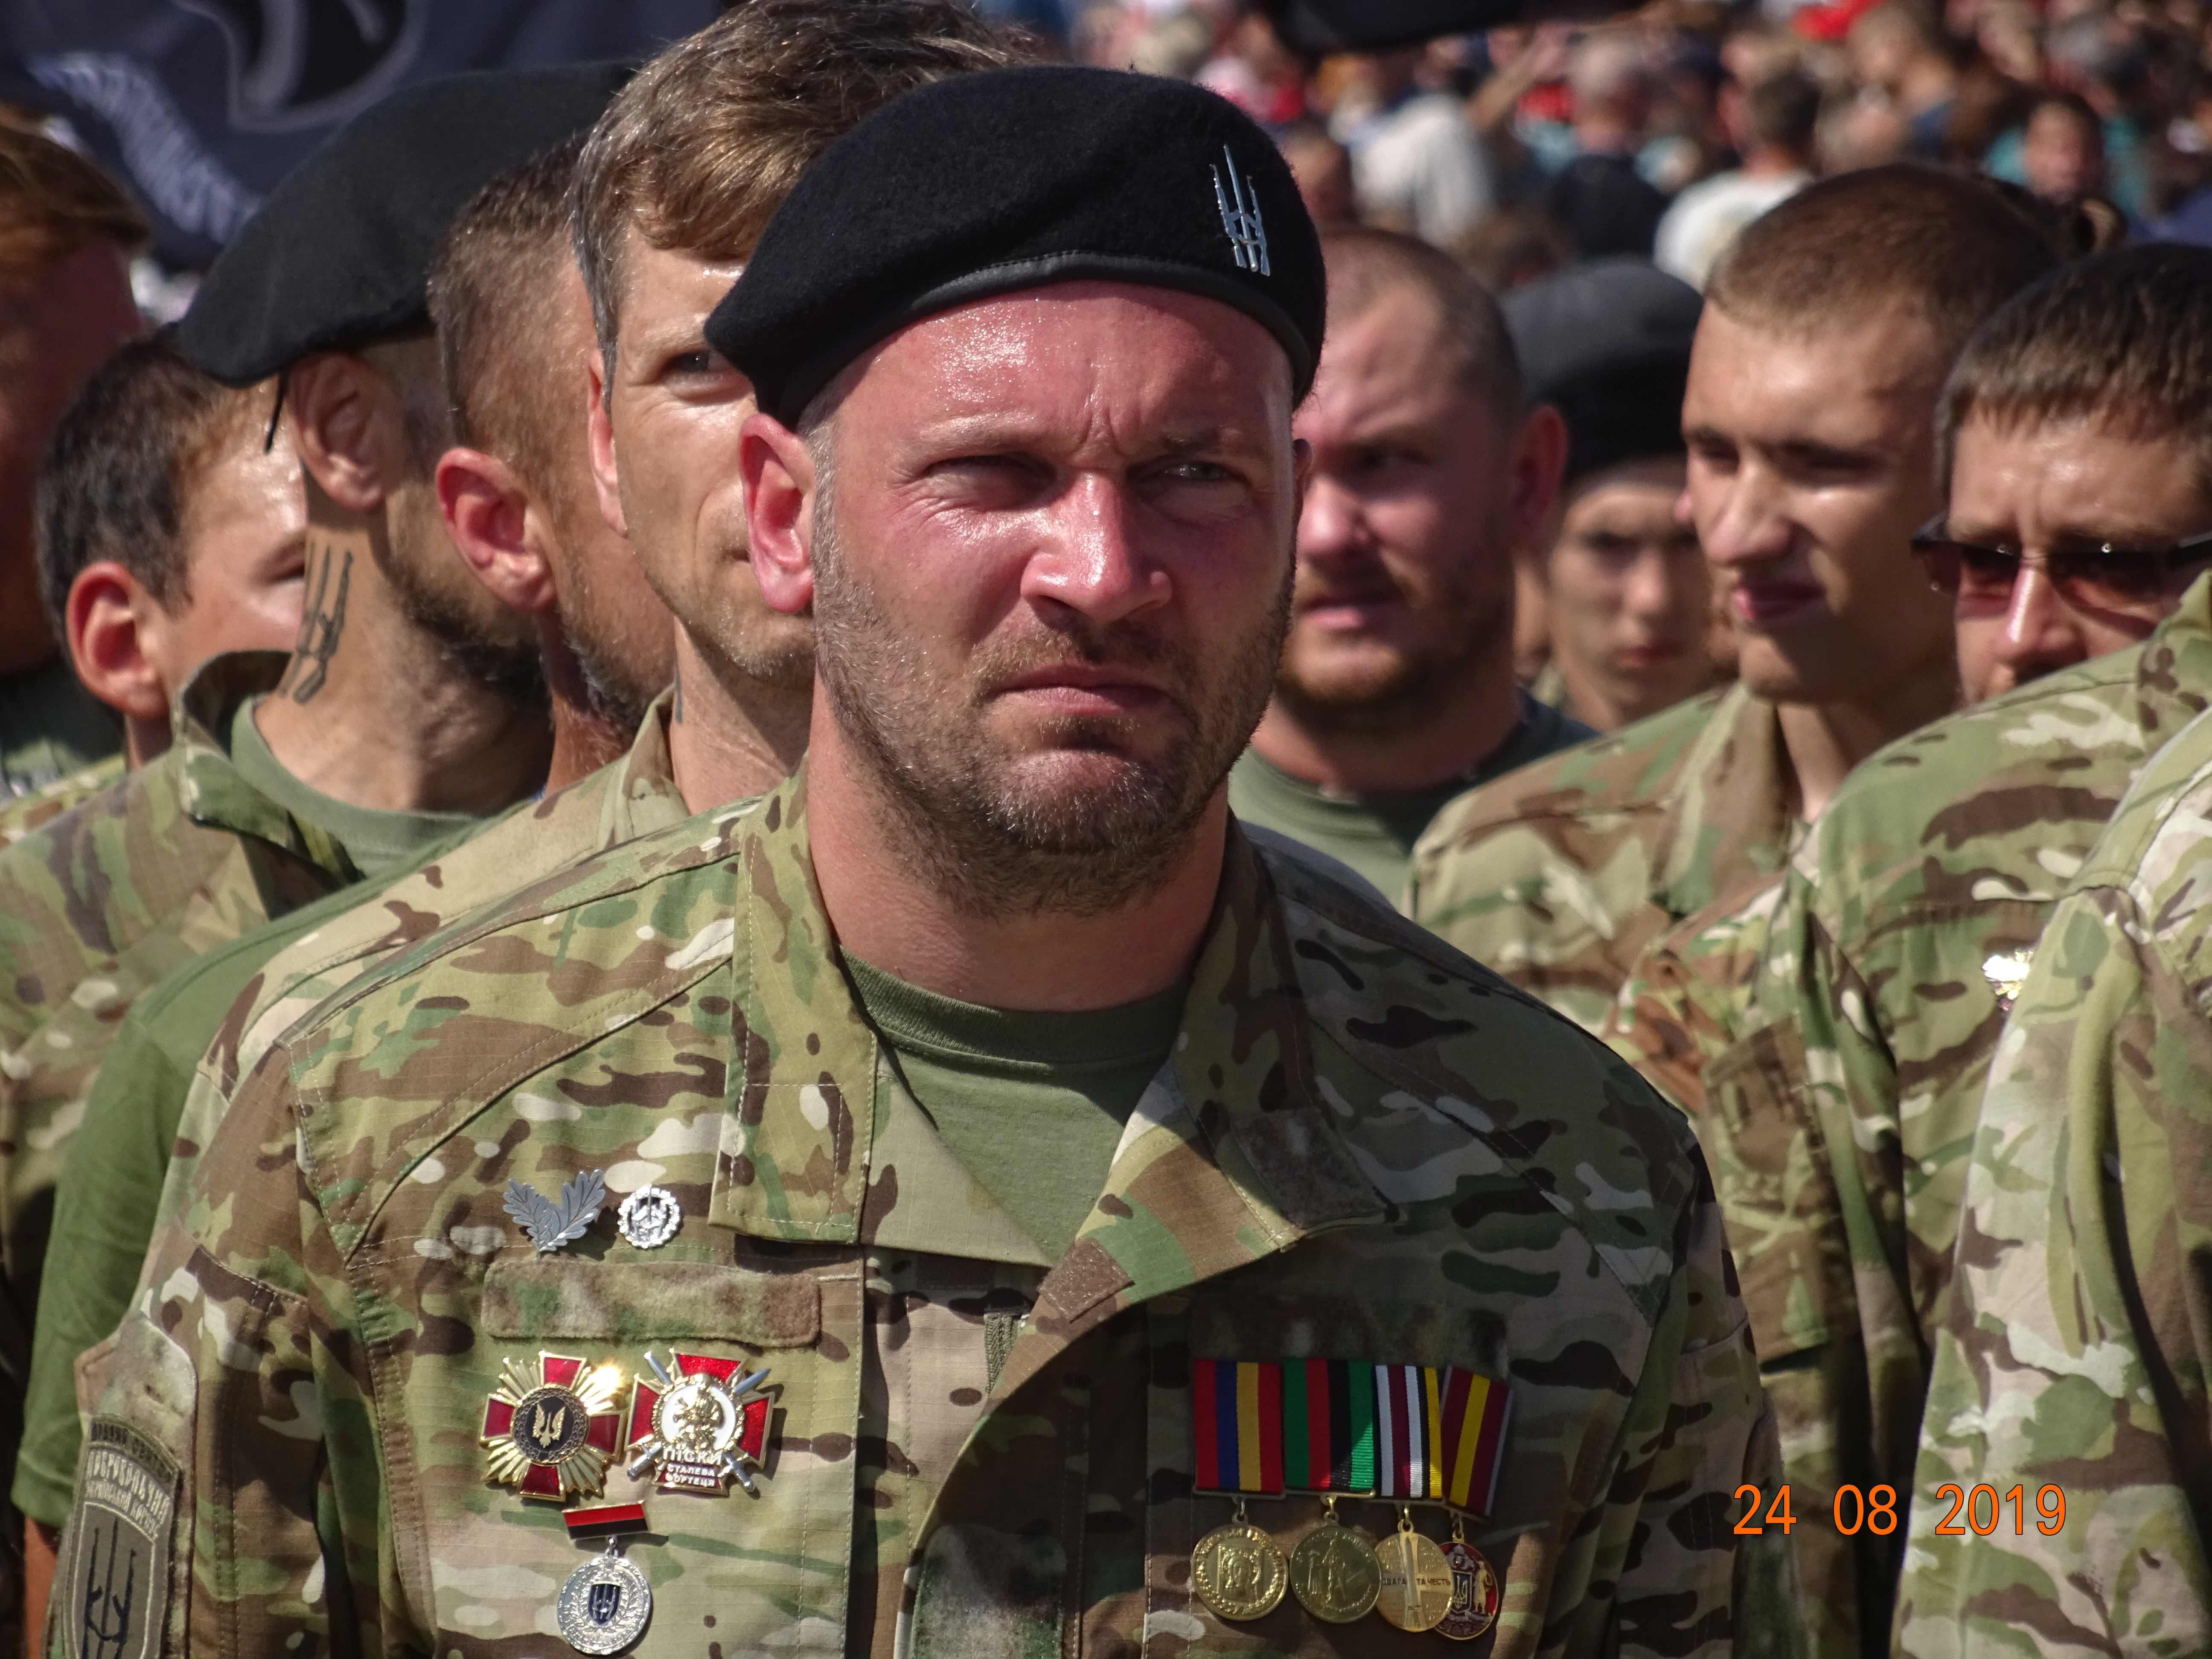 Defenders-of-Ukraine-Parad-24.Aug.19 - DSC06376.jpg